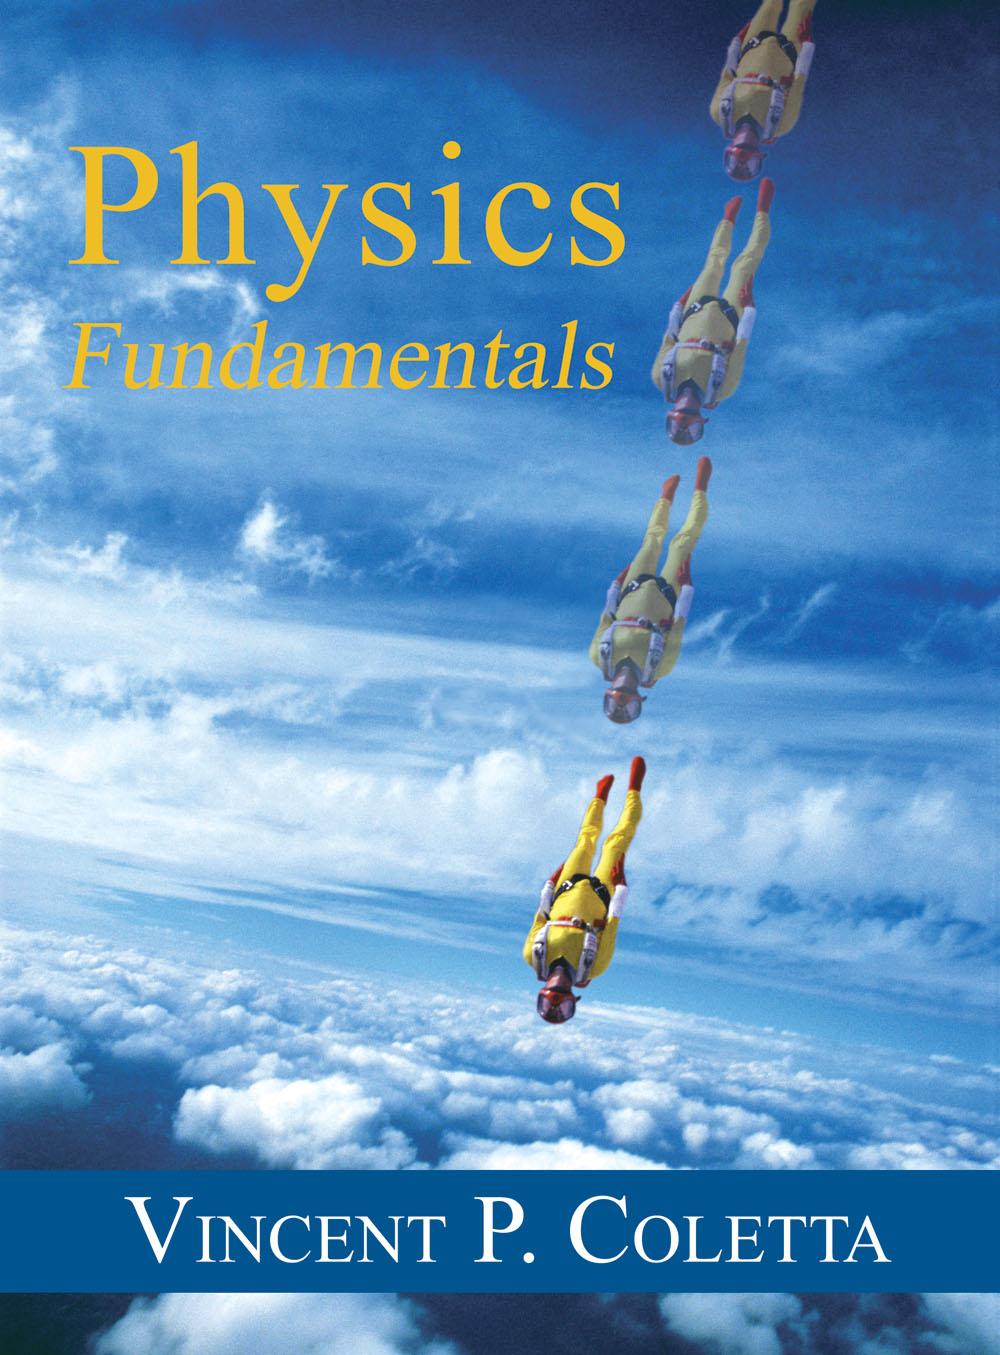 Modern Physics Textbook Pdf